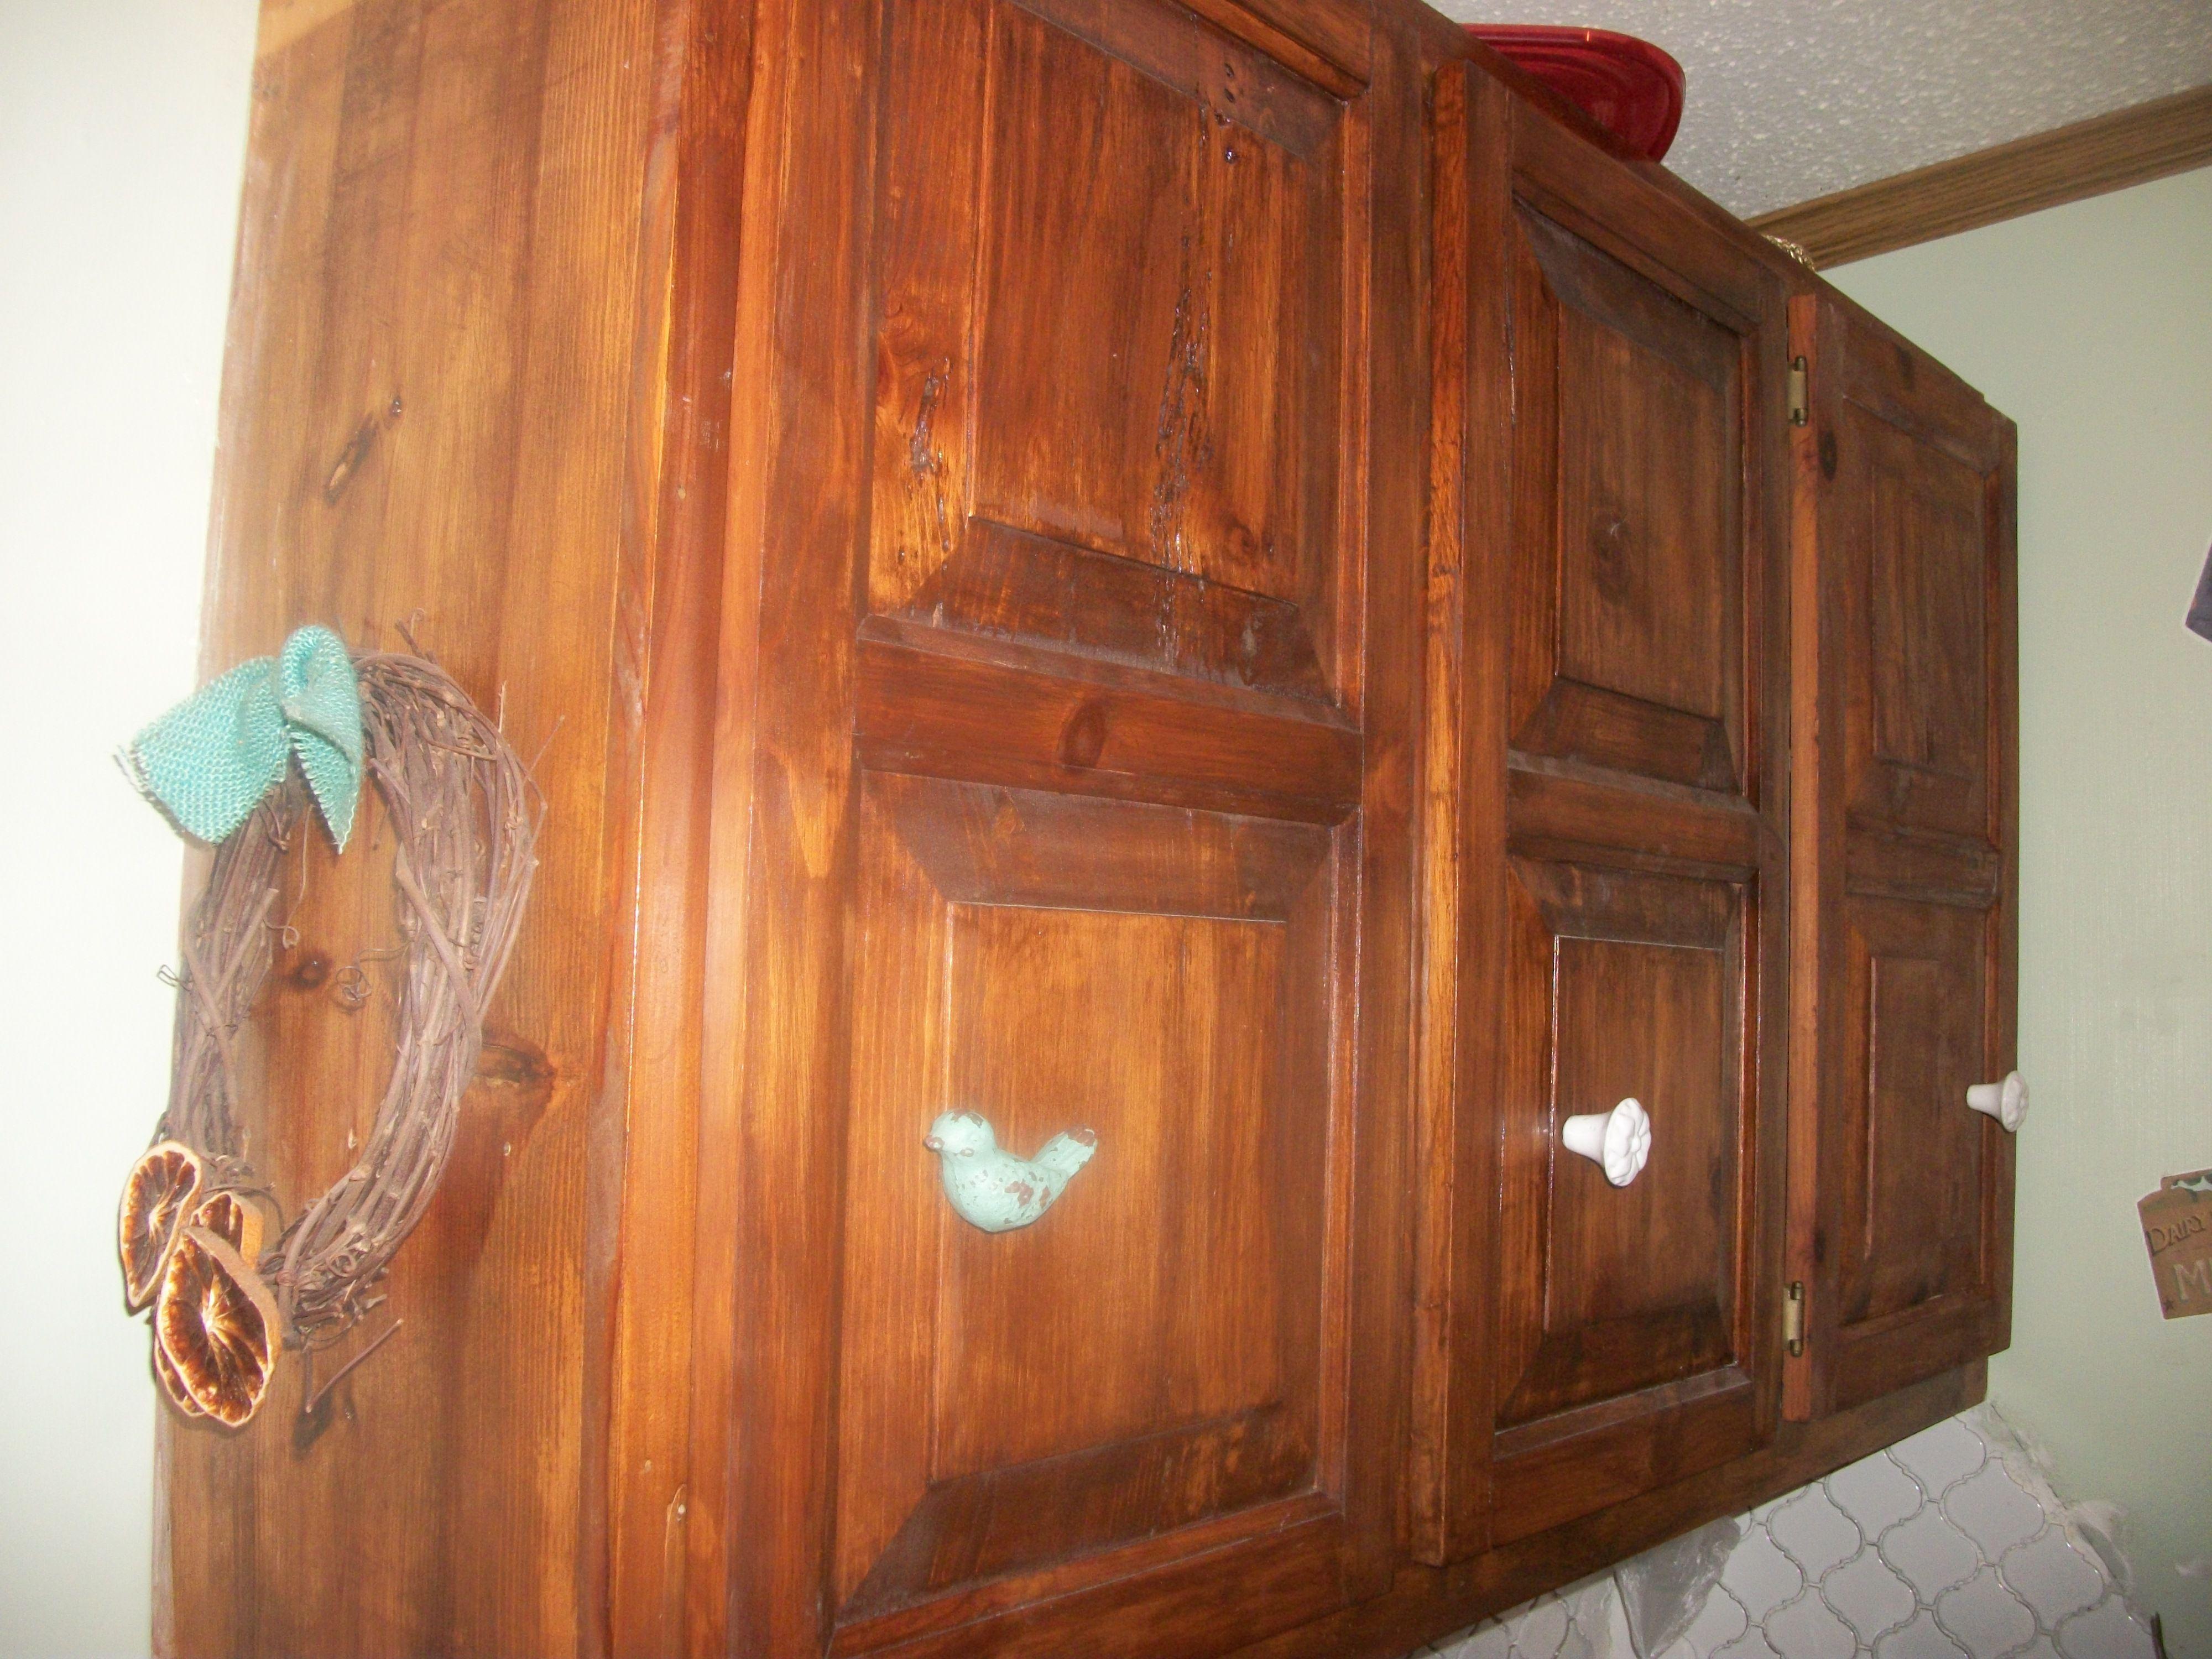 Ledge and brace oak doors - Knotty Pine